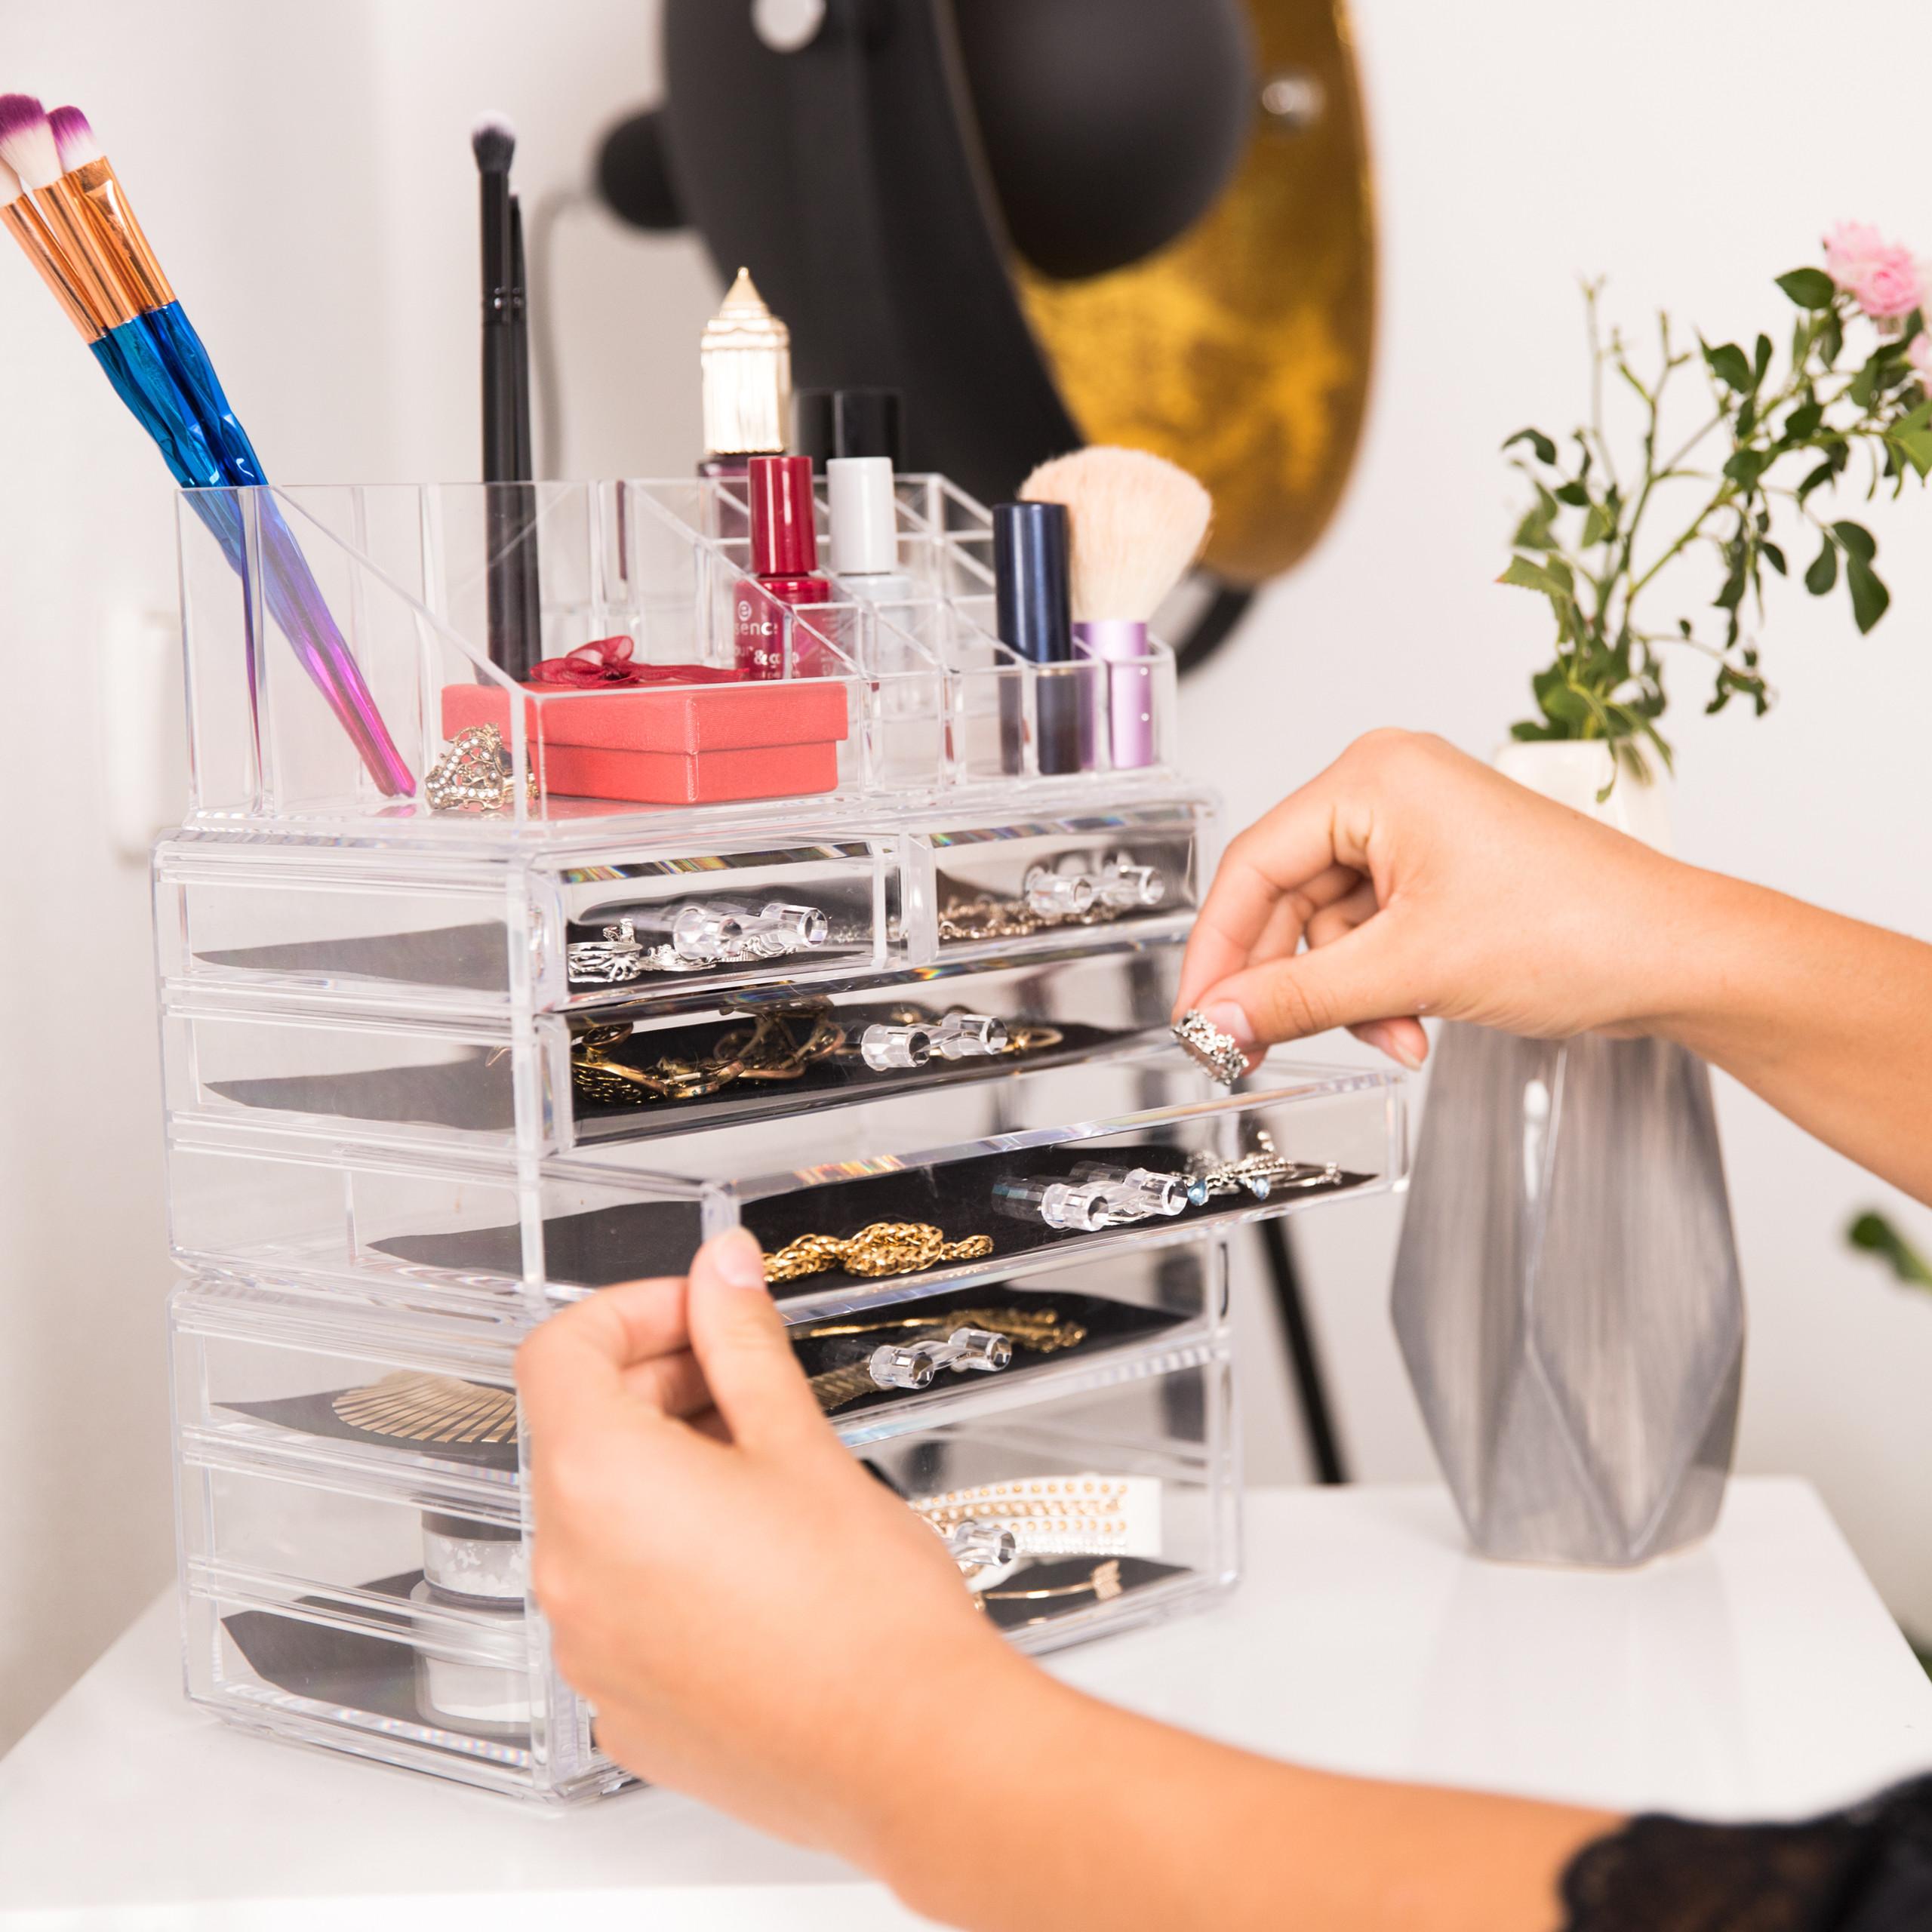 make-up-organizer-opbergen-van-cosmetica-acryl-stapelbaar-met-lades miniatuur 3